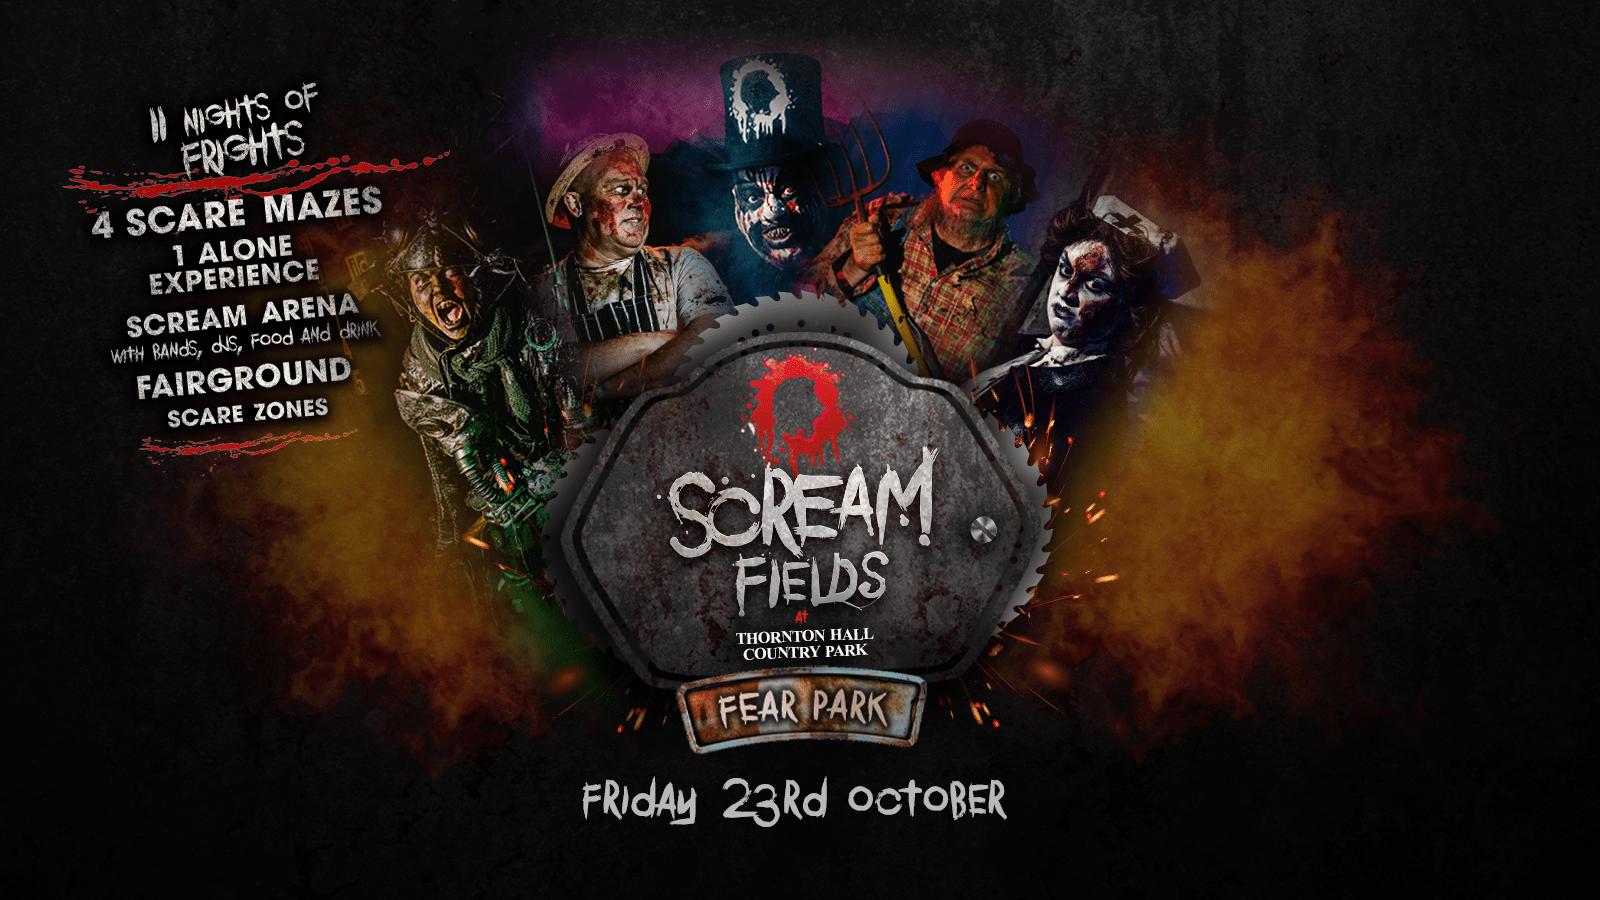 6.45PM – Screamfields: Friday 23rd October 2020